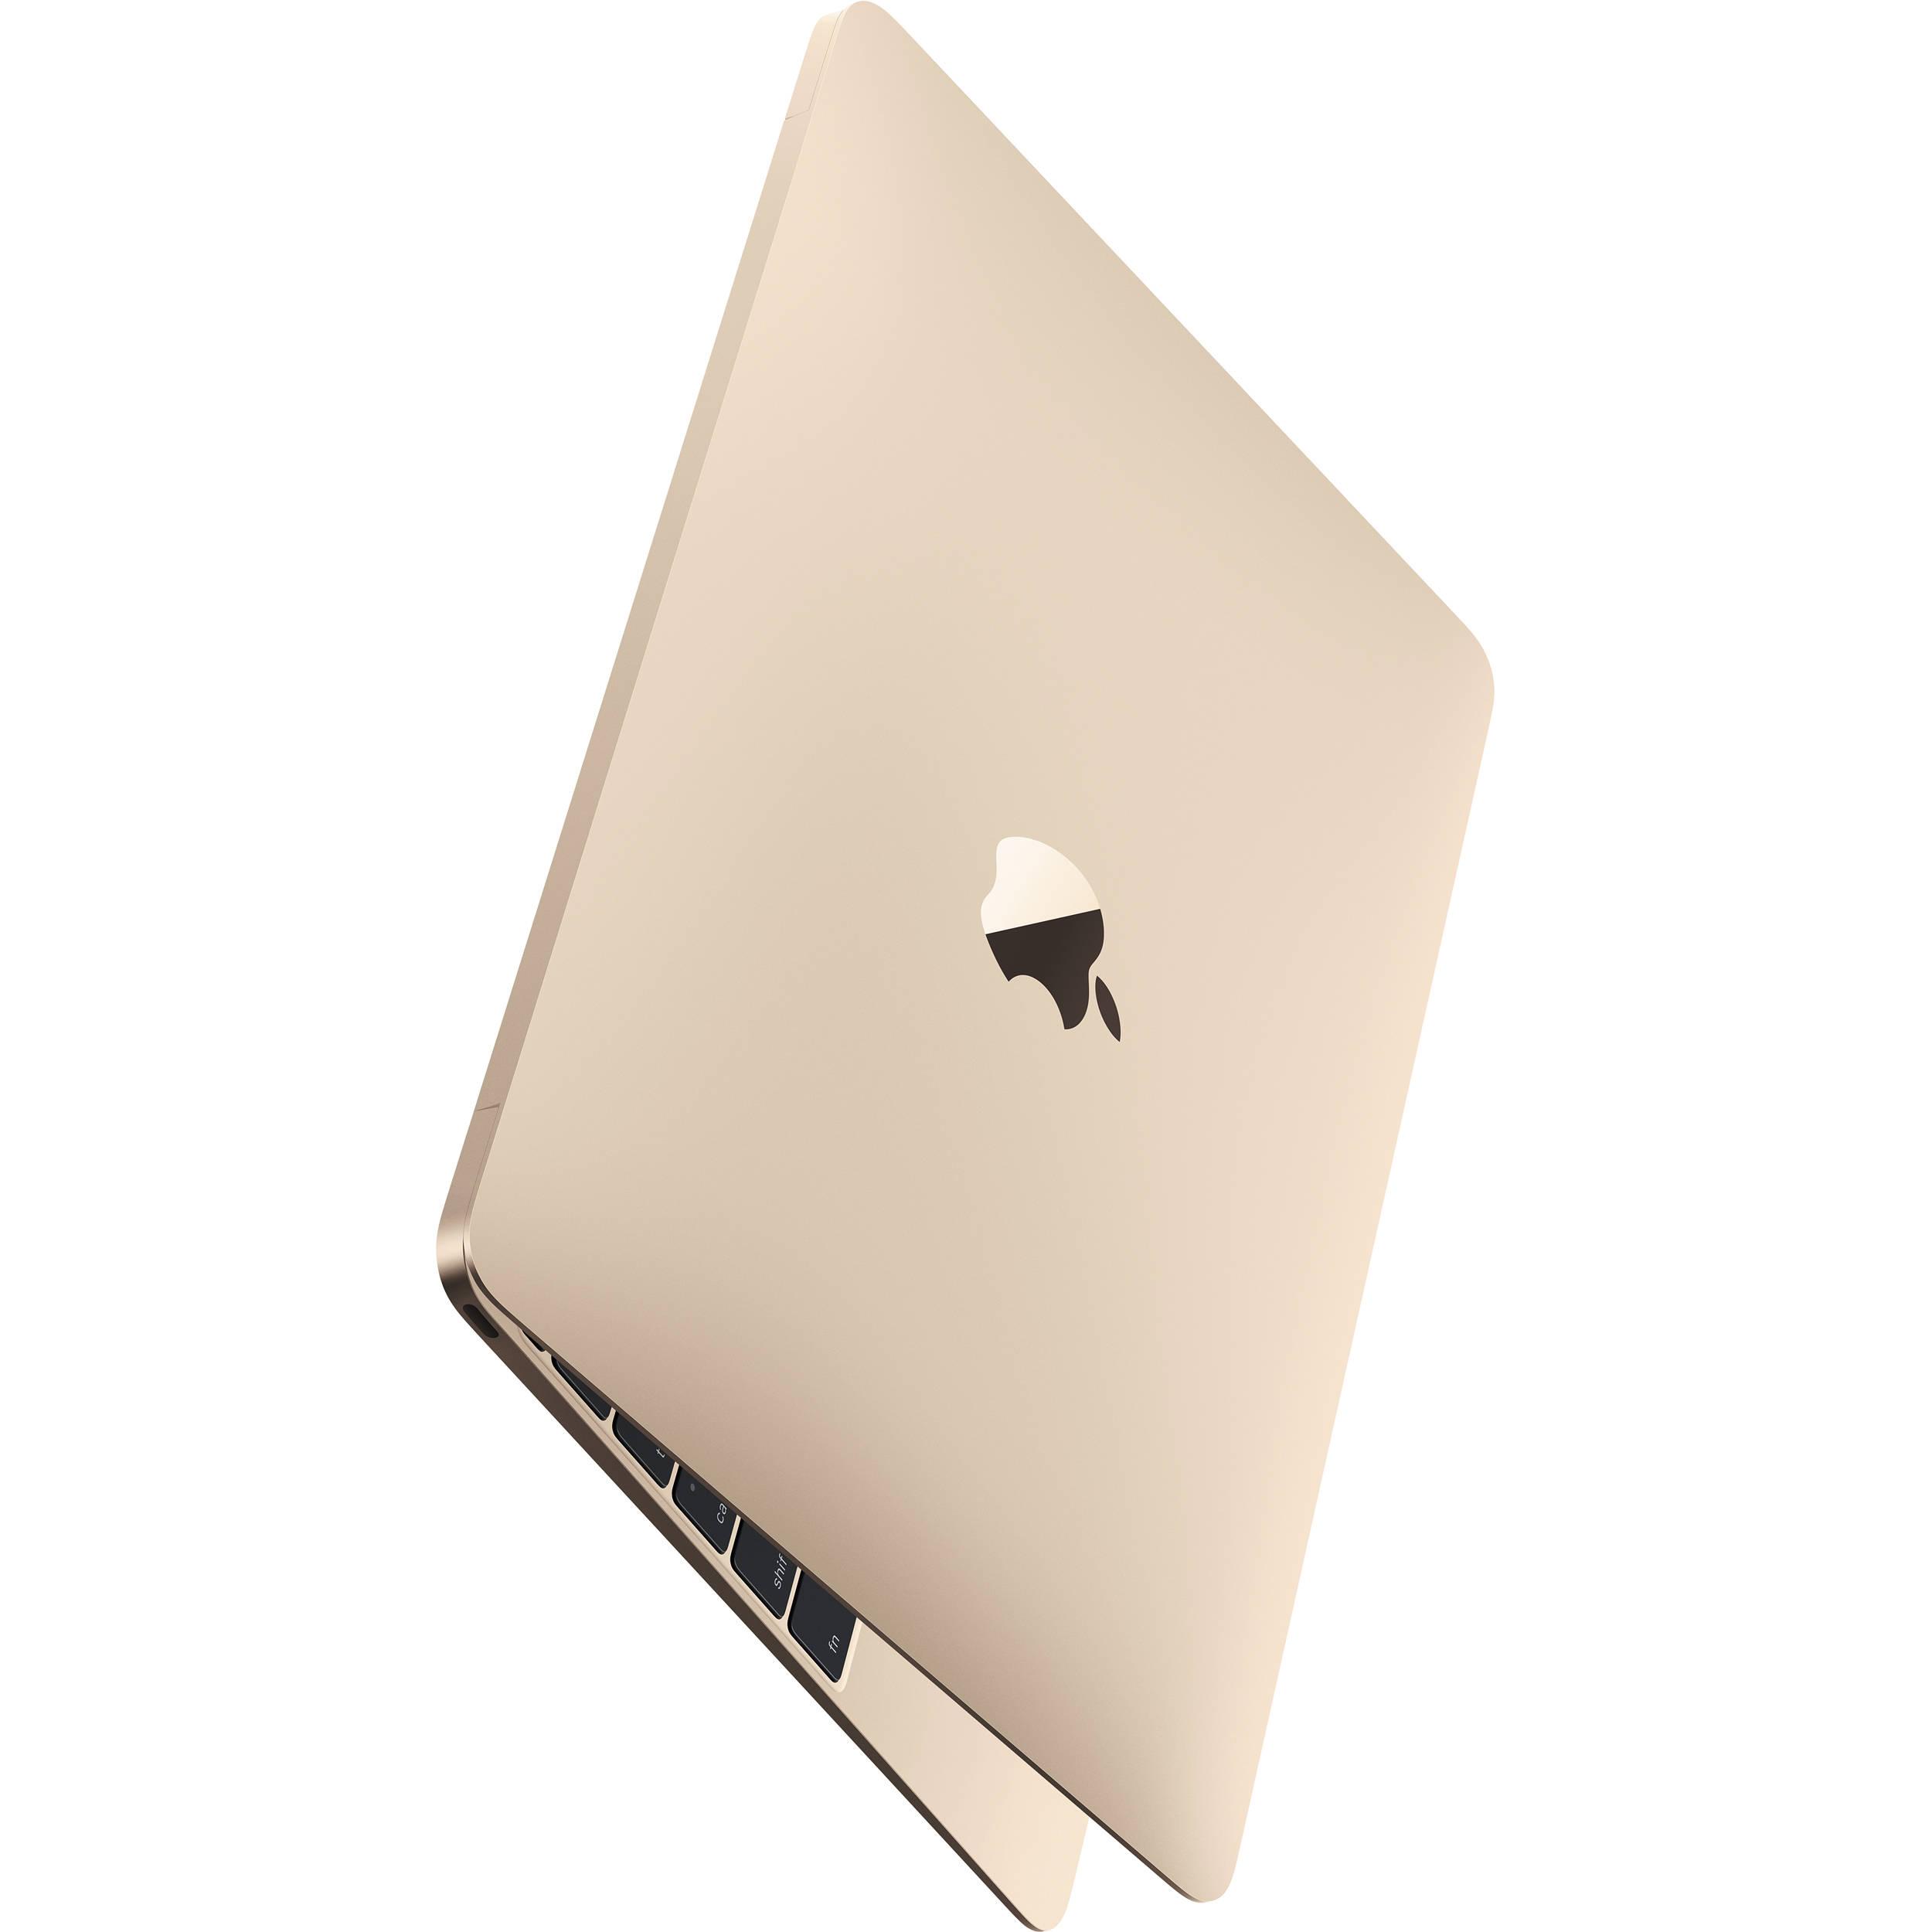 "2015 Ram 2500 >> Apple 12"" MacBook (Early 2015, Gold) MK4M2LL/A B&H Photo"